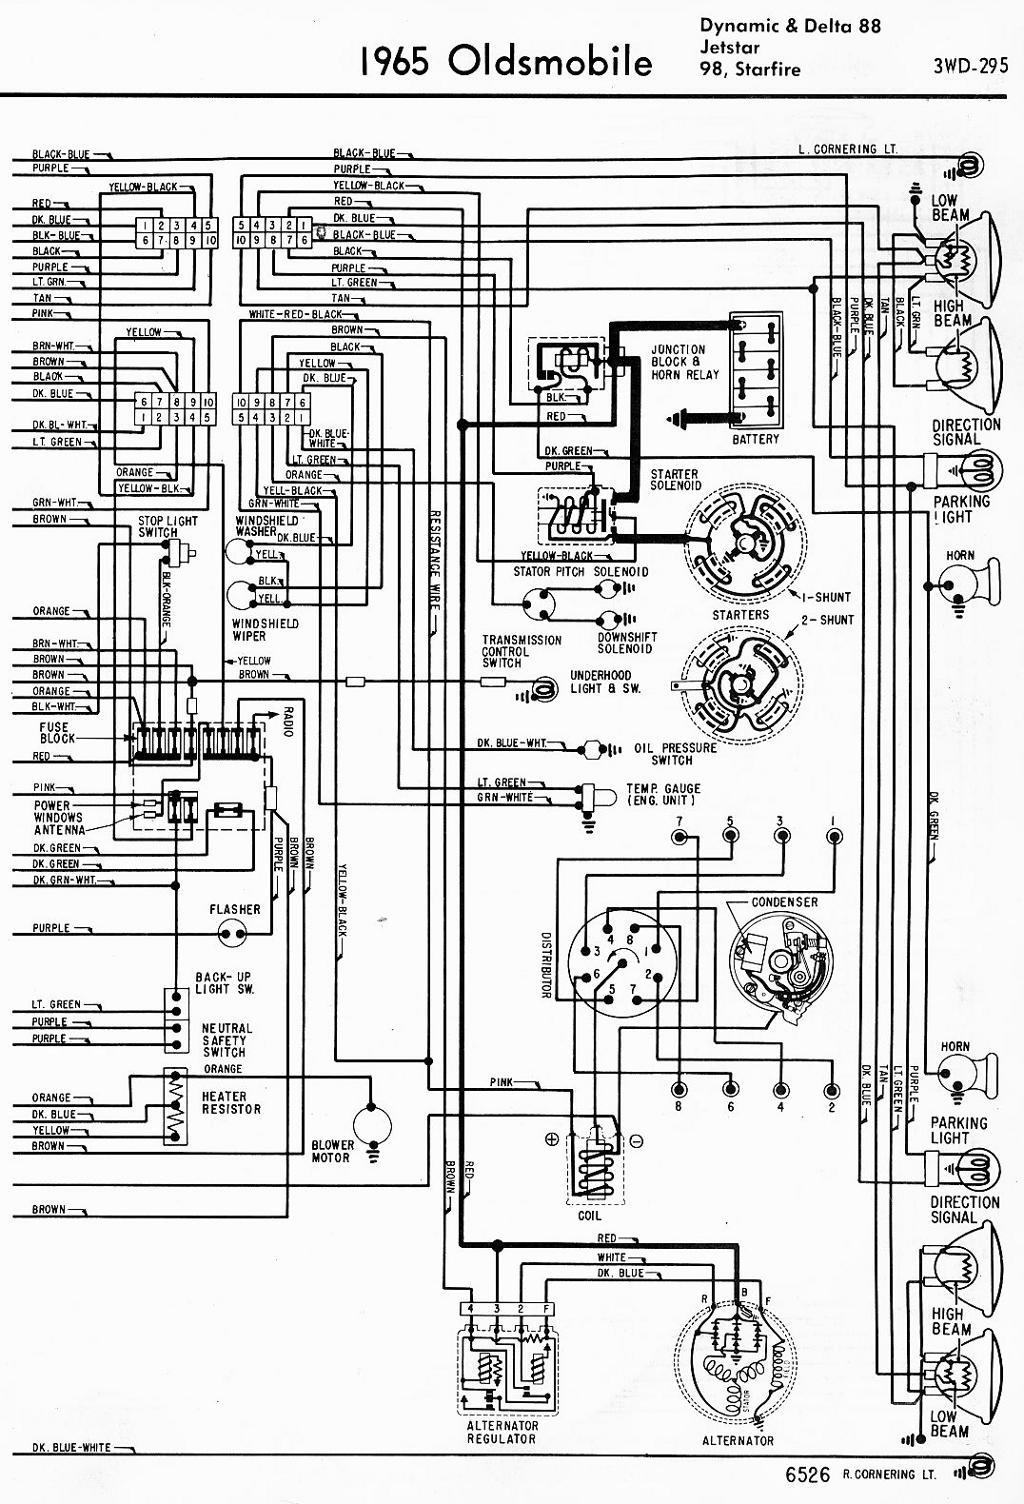 nissan tiida air con wiring diagram wiring diagram third level nissan tiida air con wiring diagram [ 1024 x 1504 Pixel ]